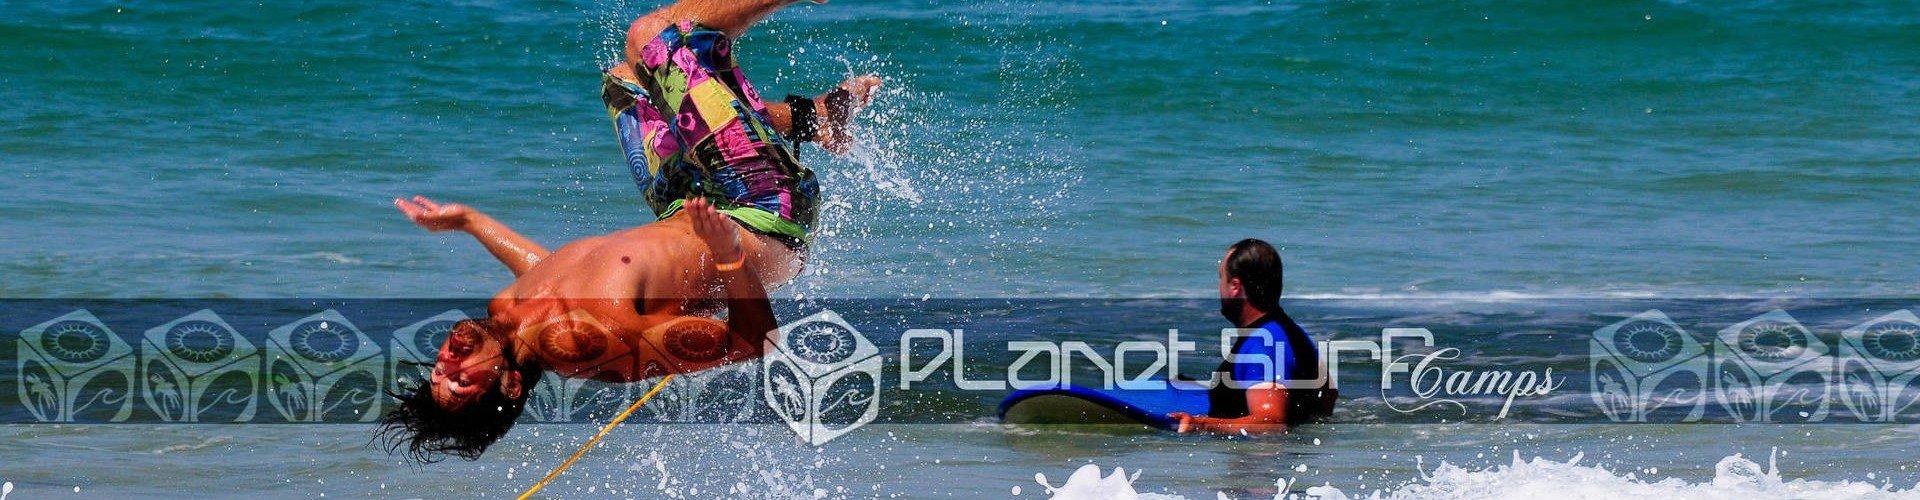 surfista saltando al agua